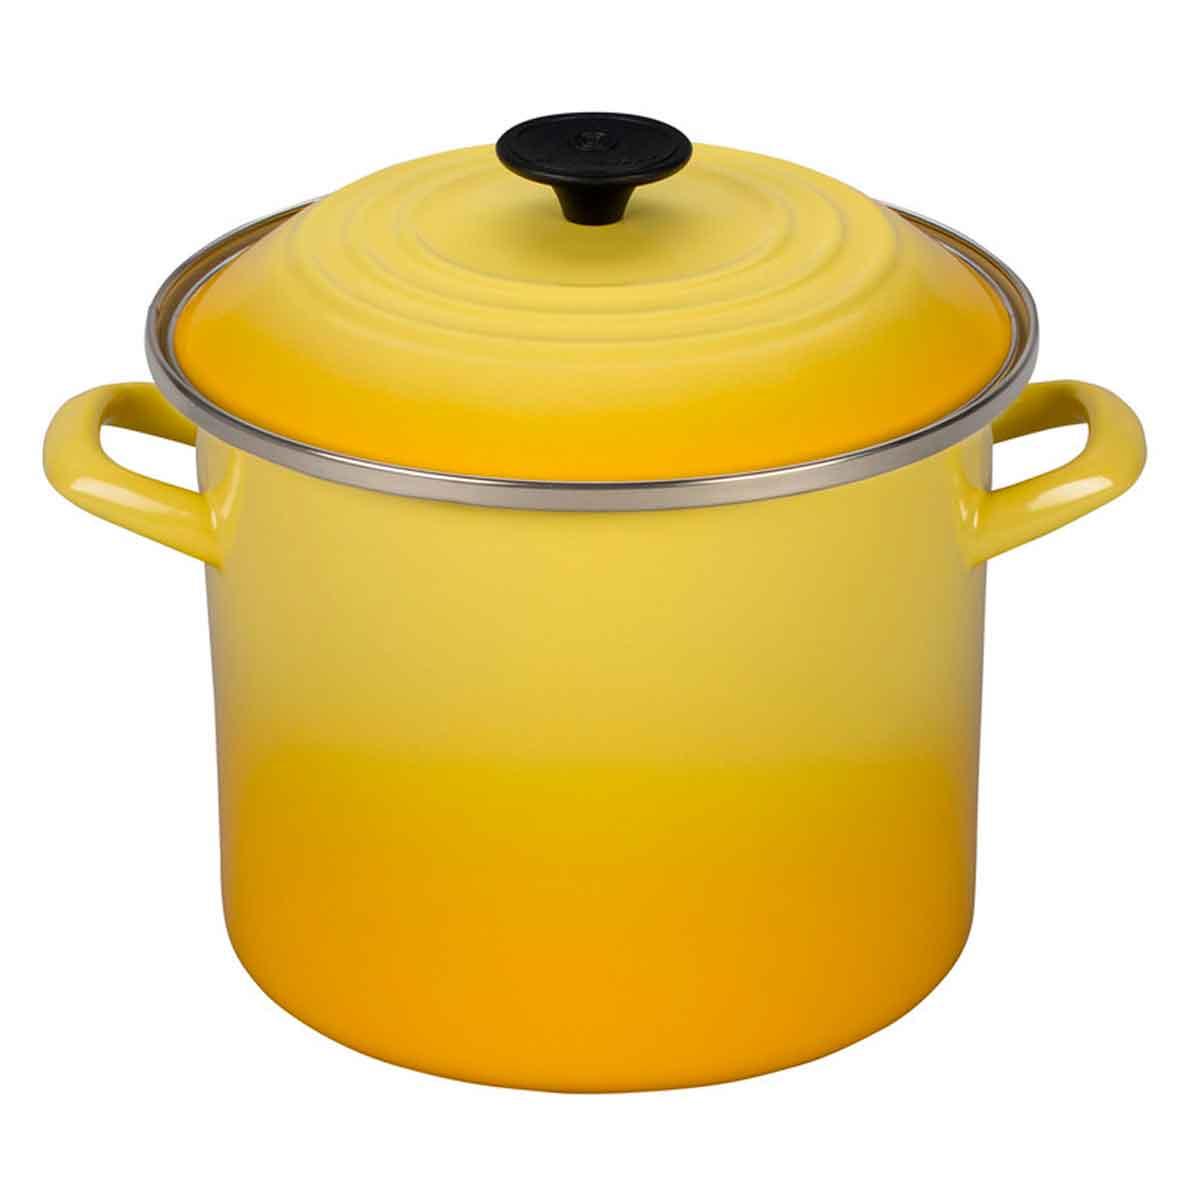 Caldeirão Stock Pot 7,3 Litros Amarelo Sun Le Creuset